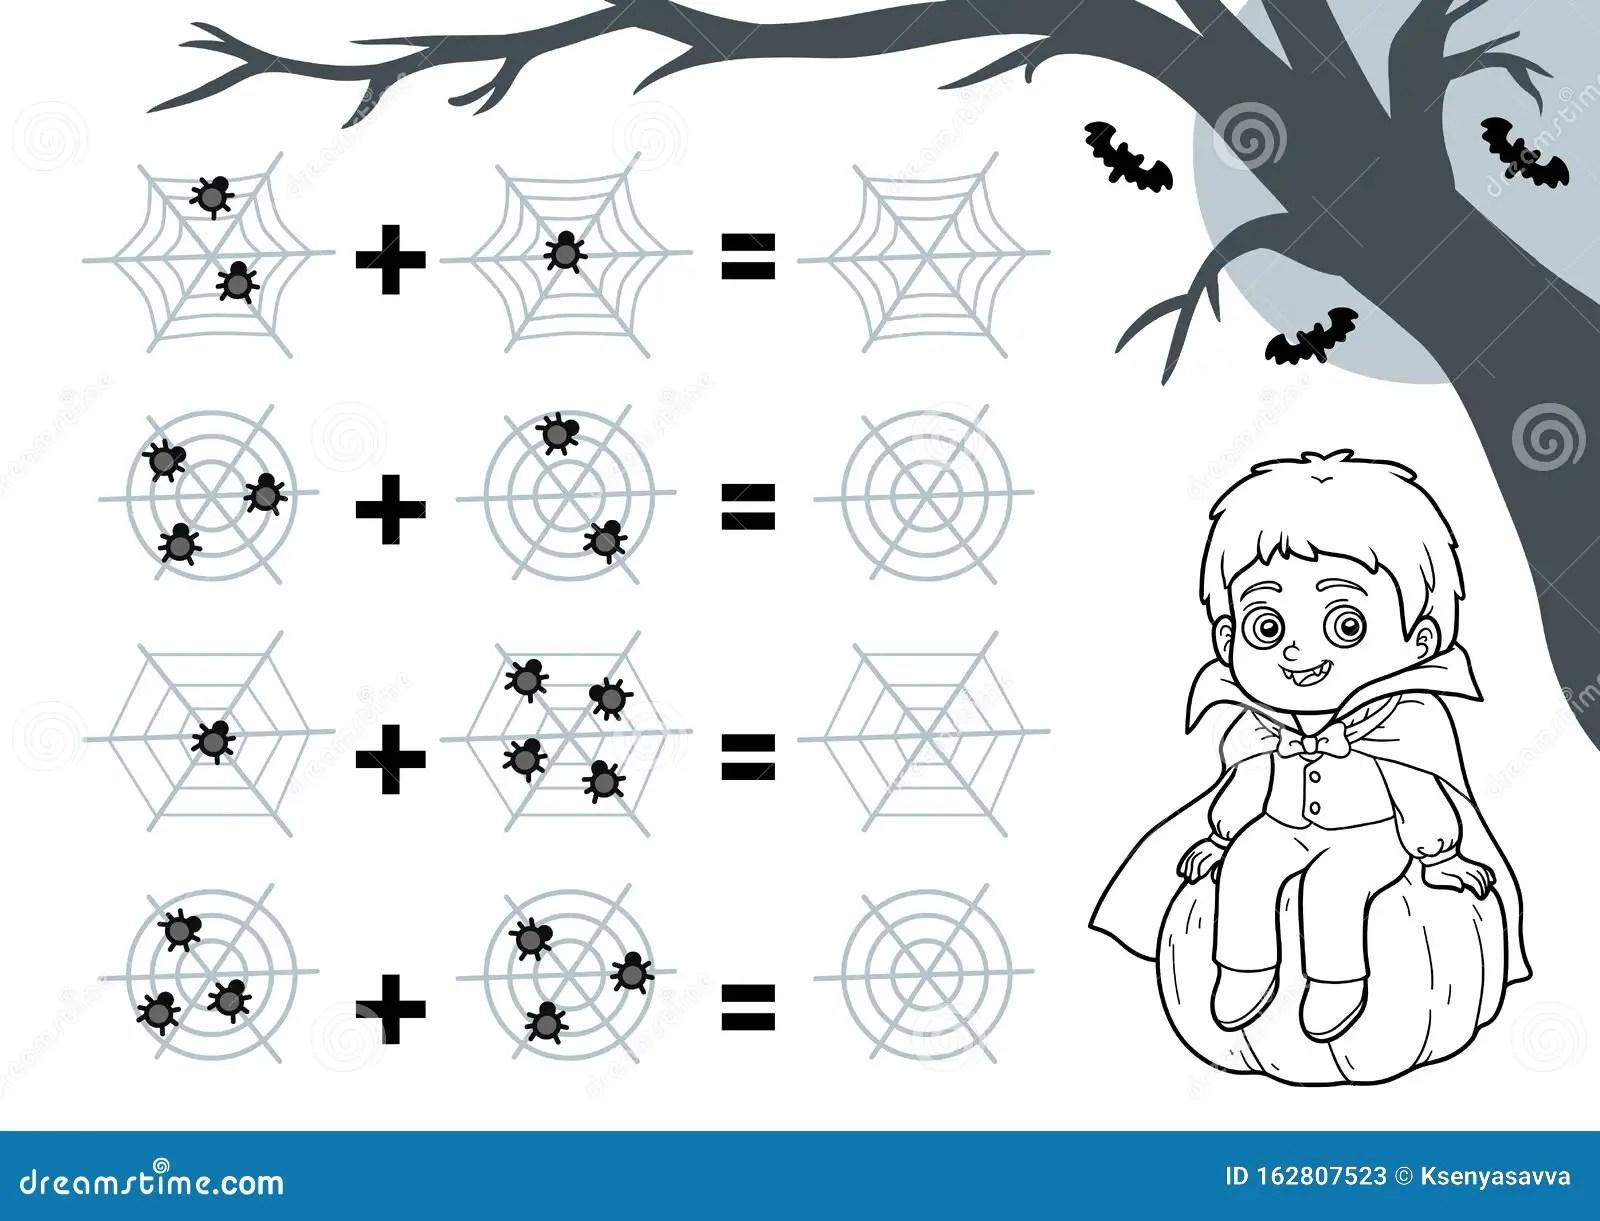 Counting Game For Preschool Children Halloween Characters